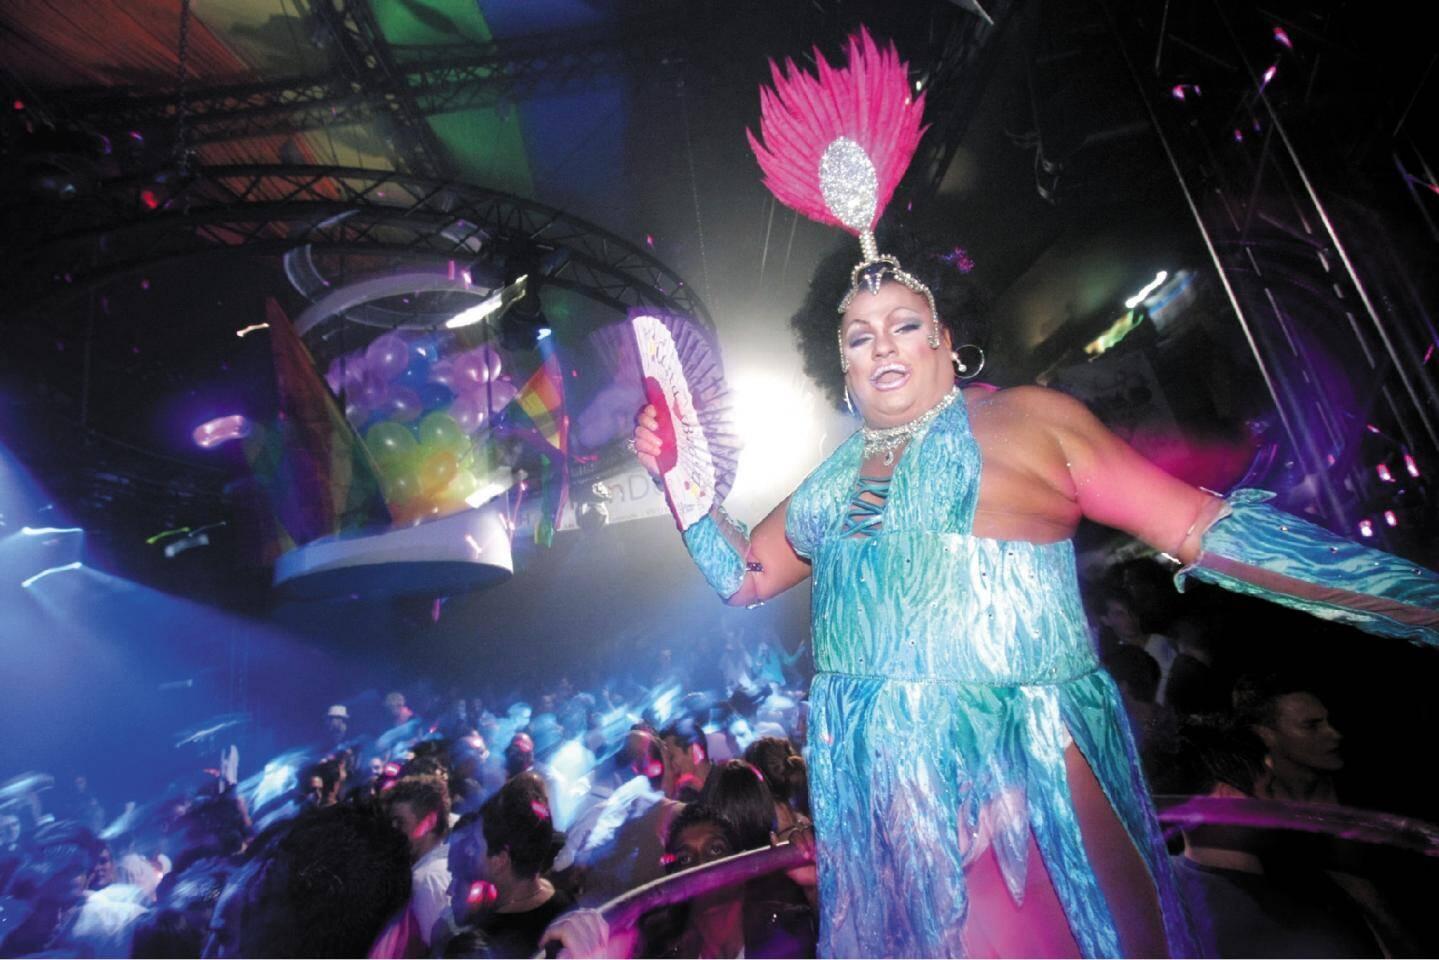 Miss Koka lors d'un show au High Club en 2008